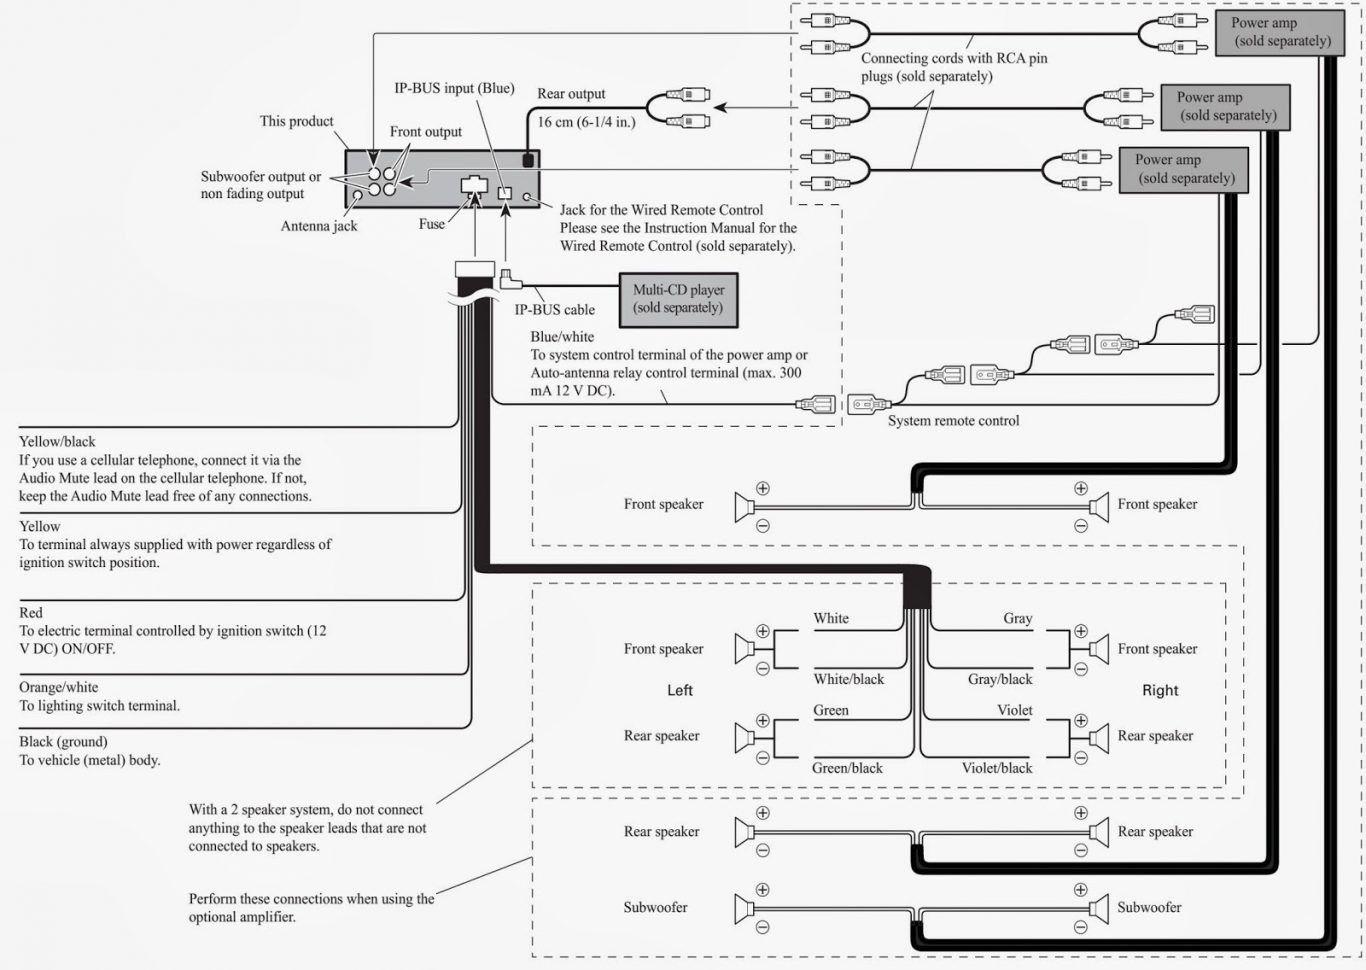 pioneer deh 3400ub wire diagram use wiring diagram pioneer deh 3400ub wiring diagram [ 1366 x 970 Pixel ]